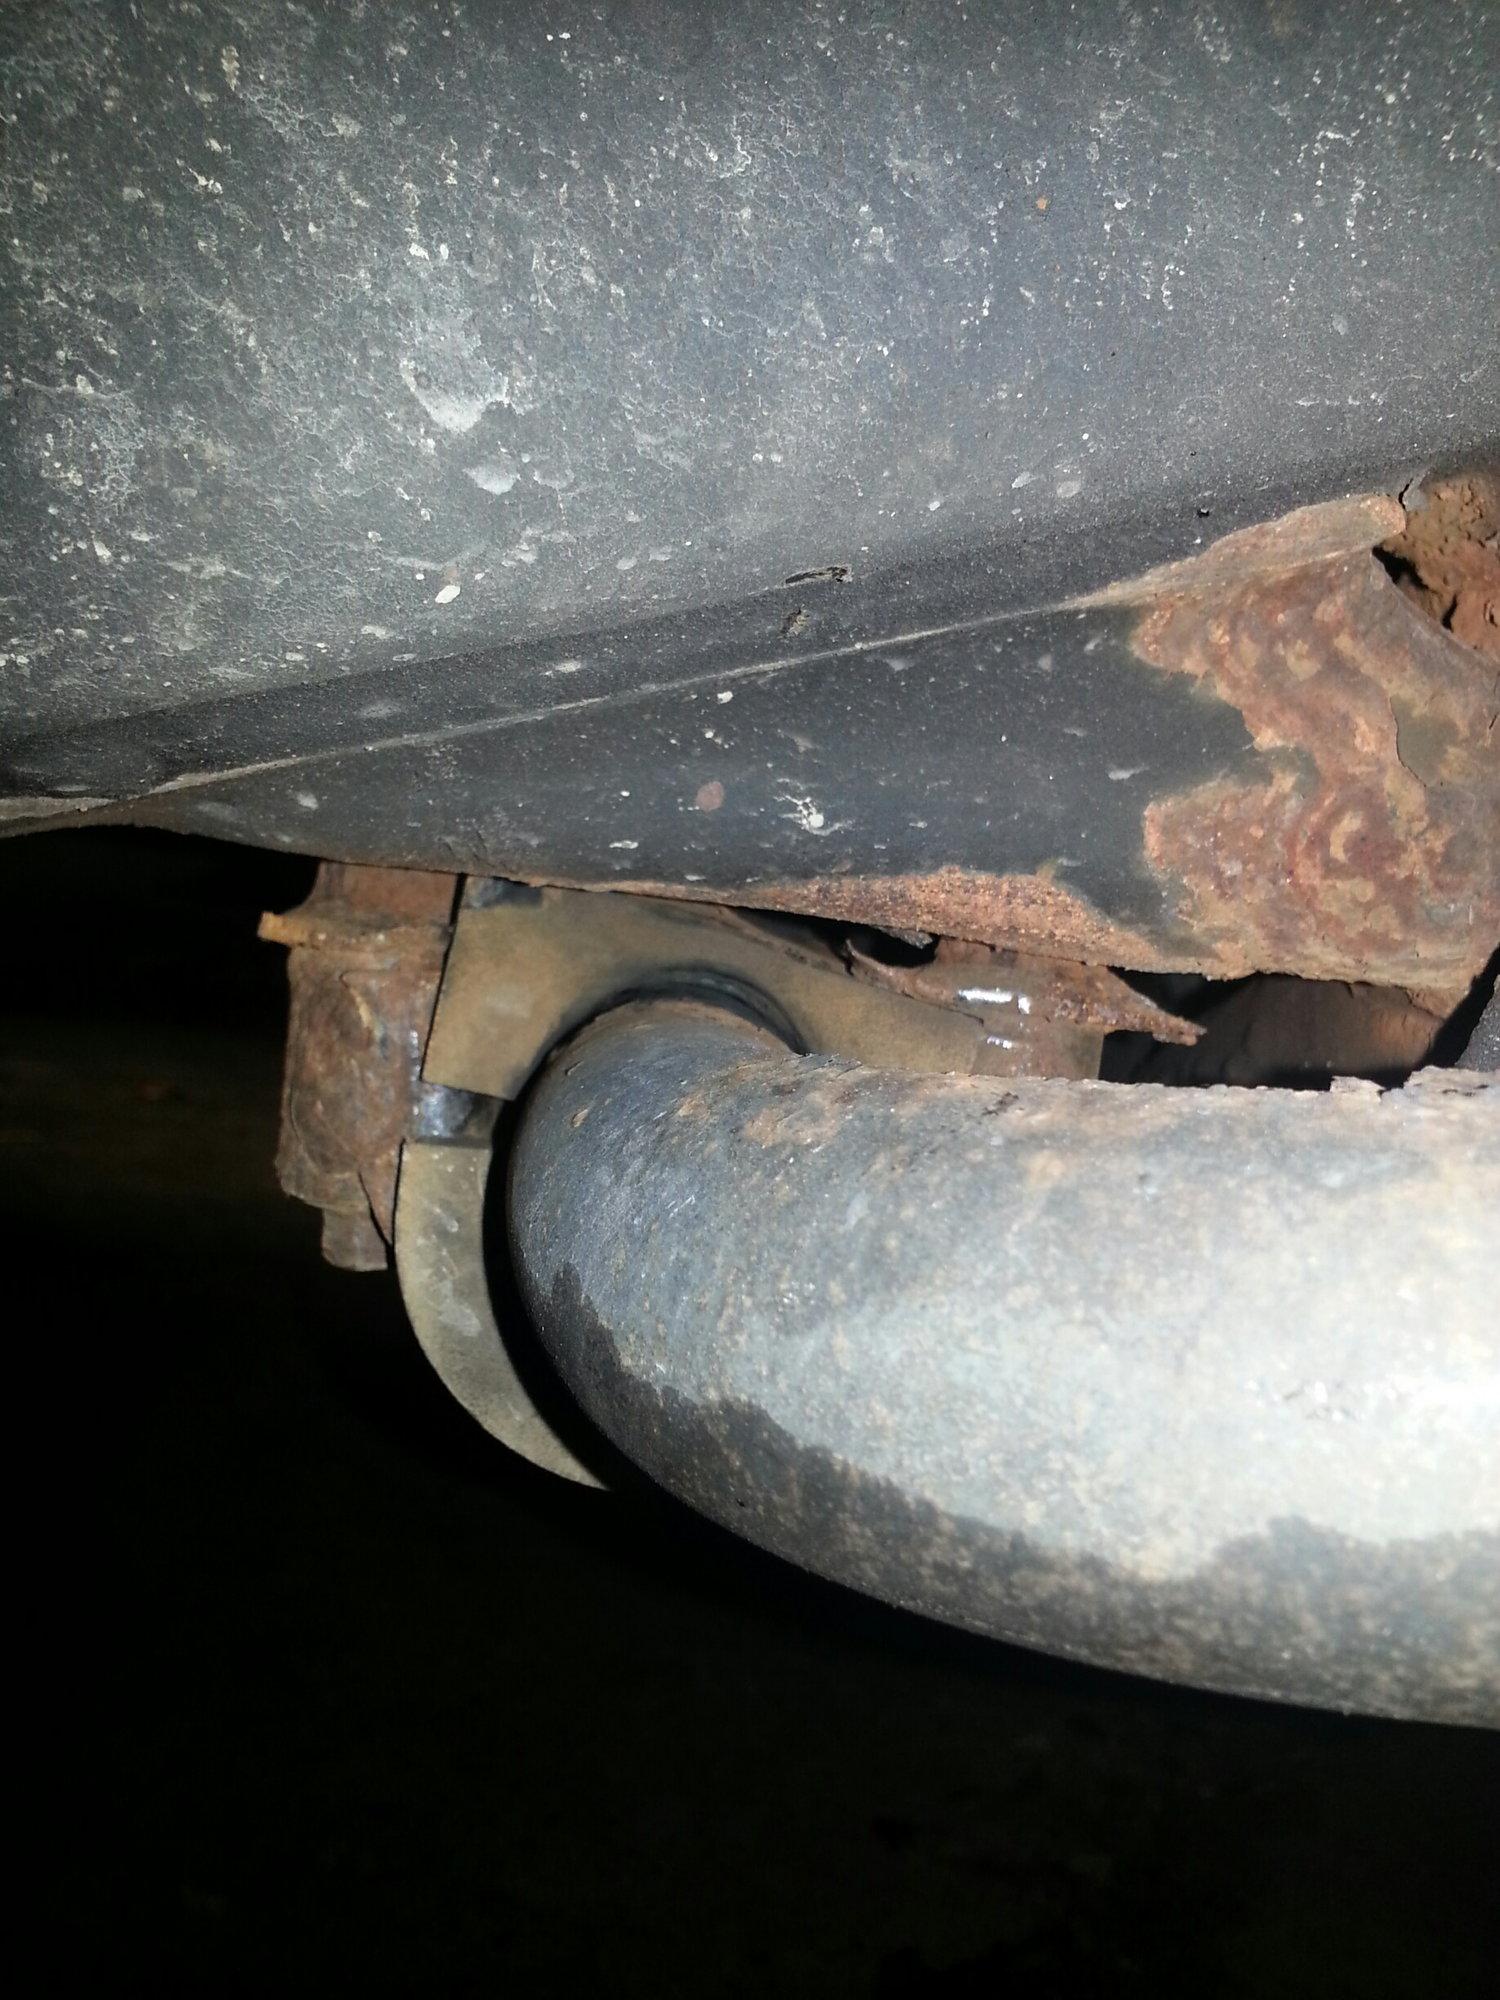 Trailblazer frame rot